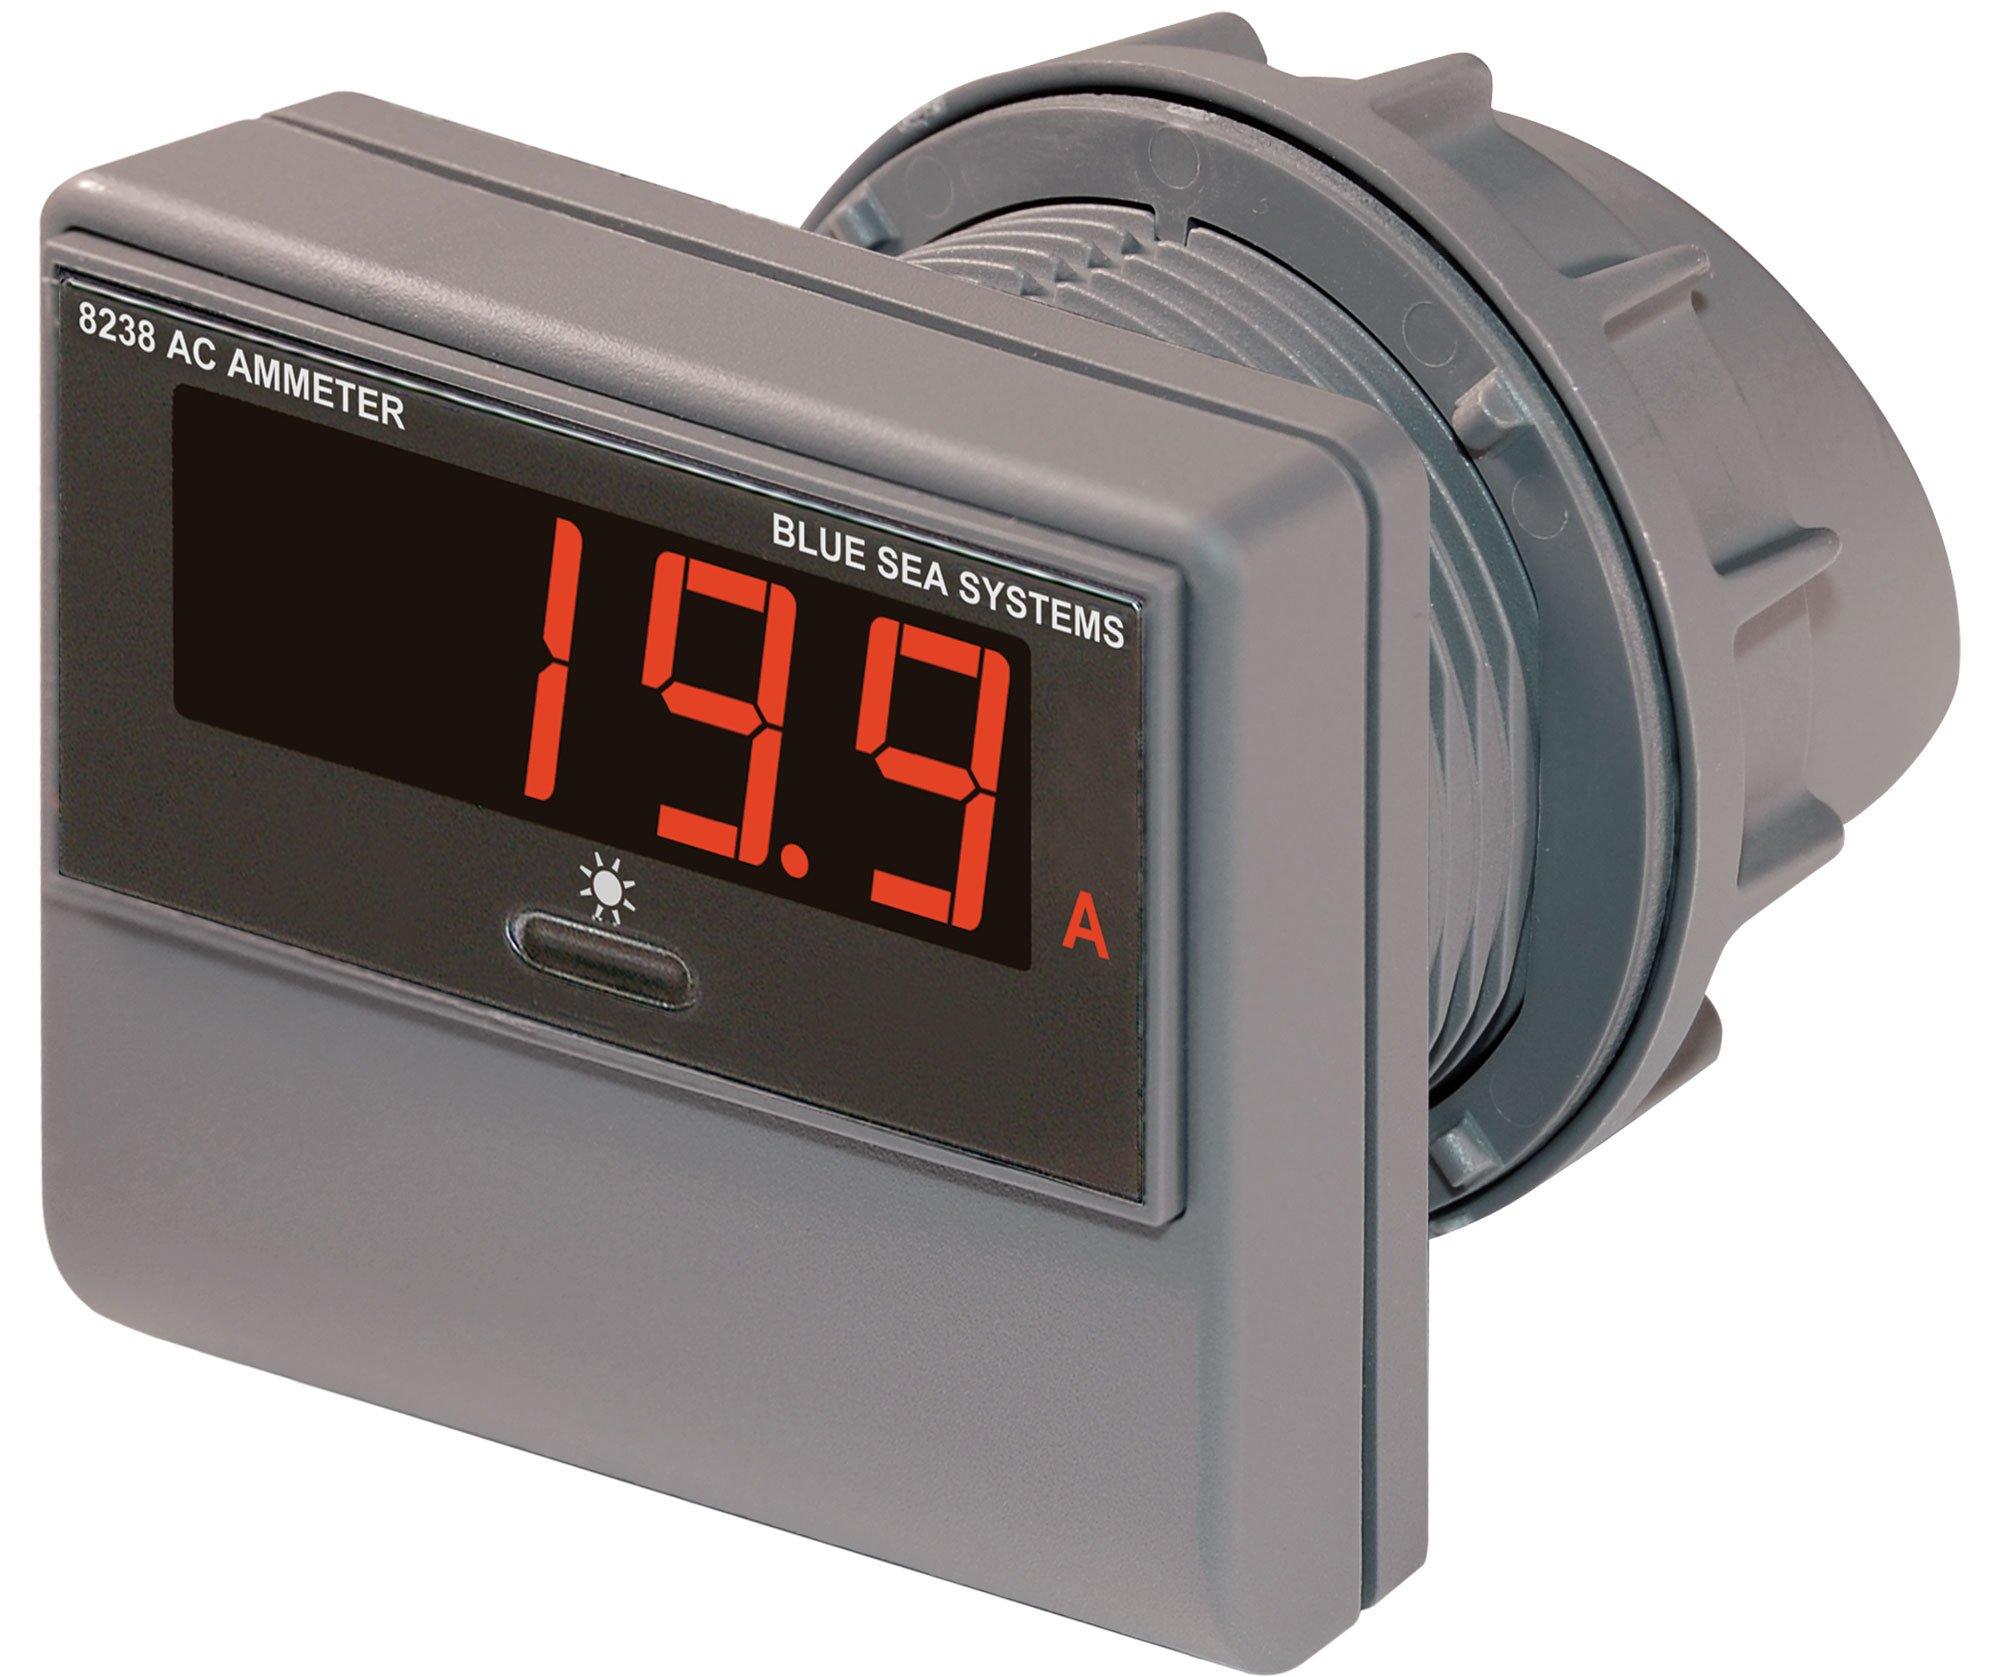 Blue Sea Systems 0 to 150A AC Digital Ammeter